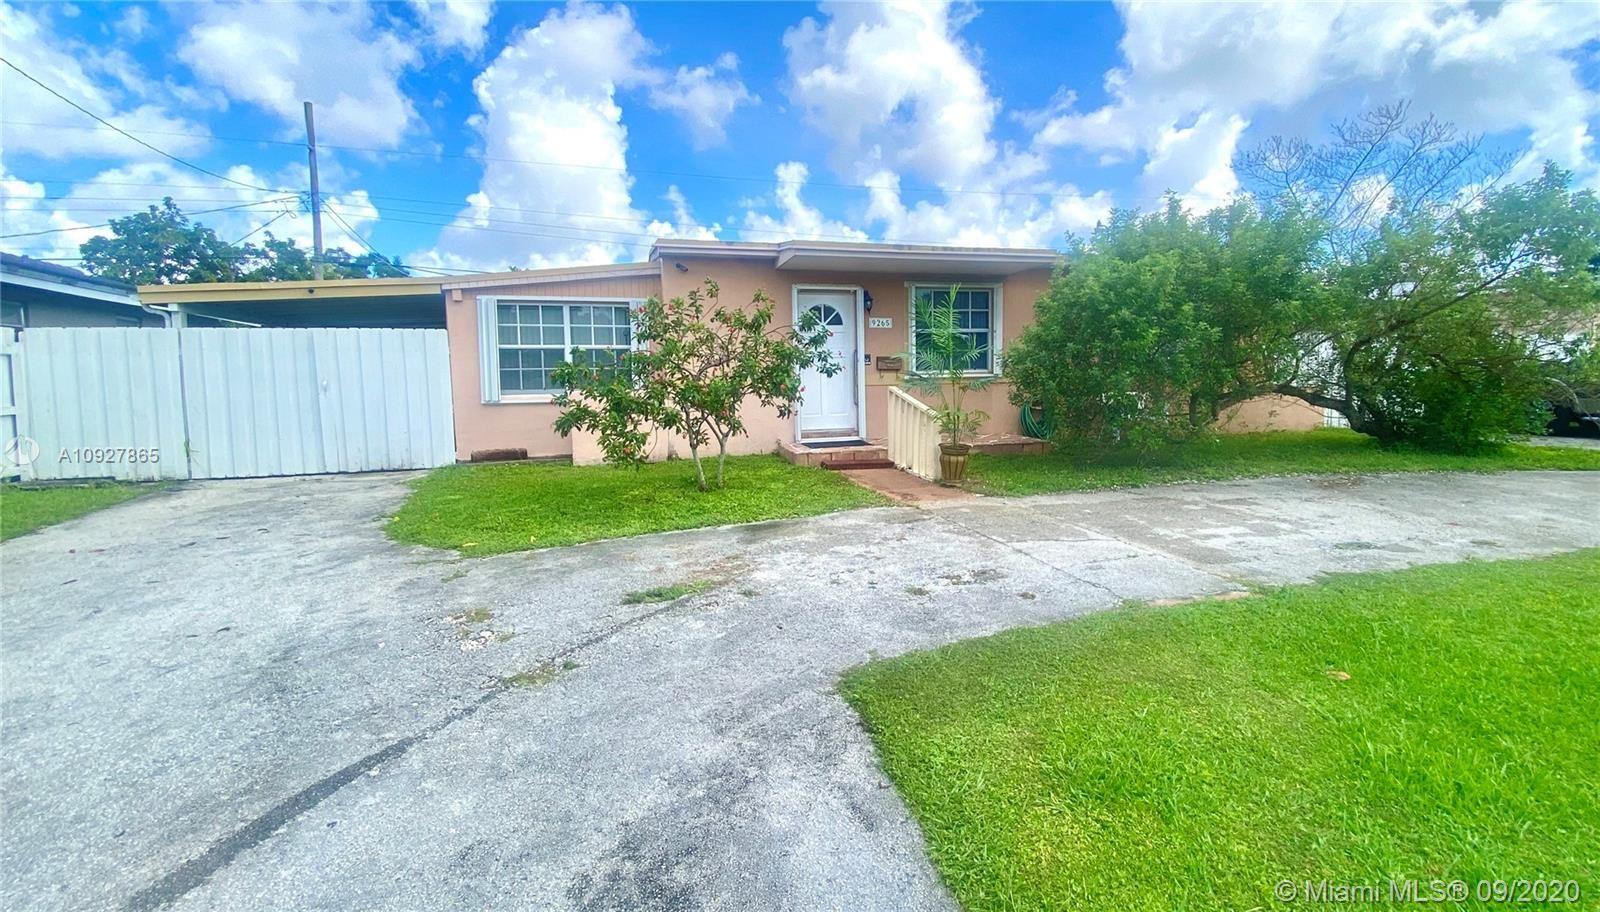 9265 SW 43rd St, Miami, FL 33165 - #: A10927865